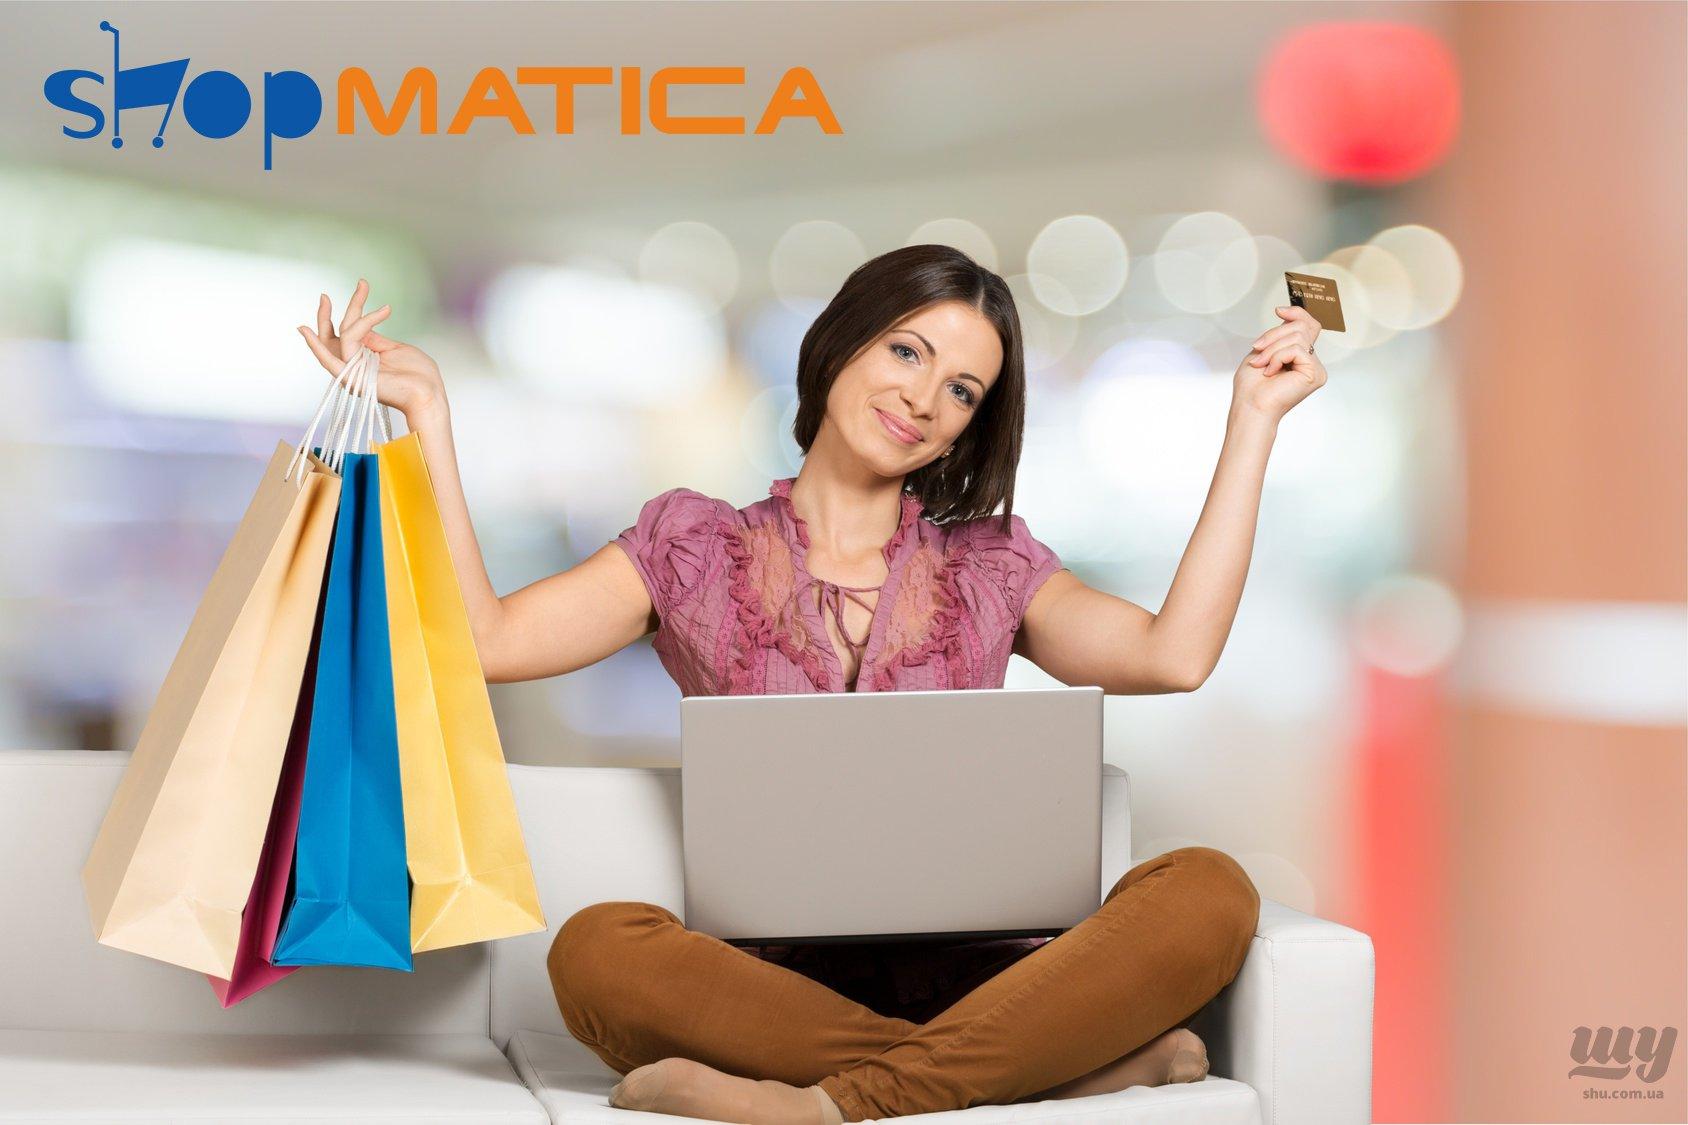 Shopmatica.jpg